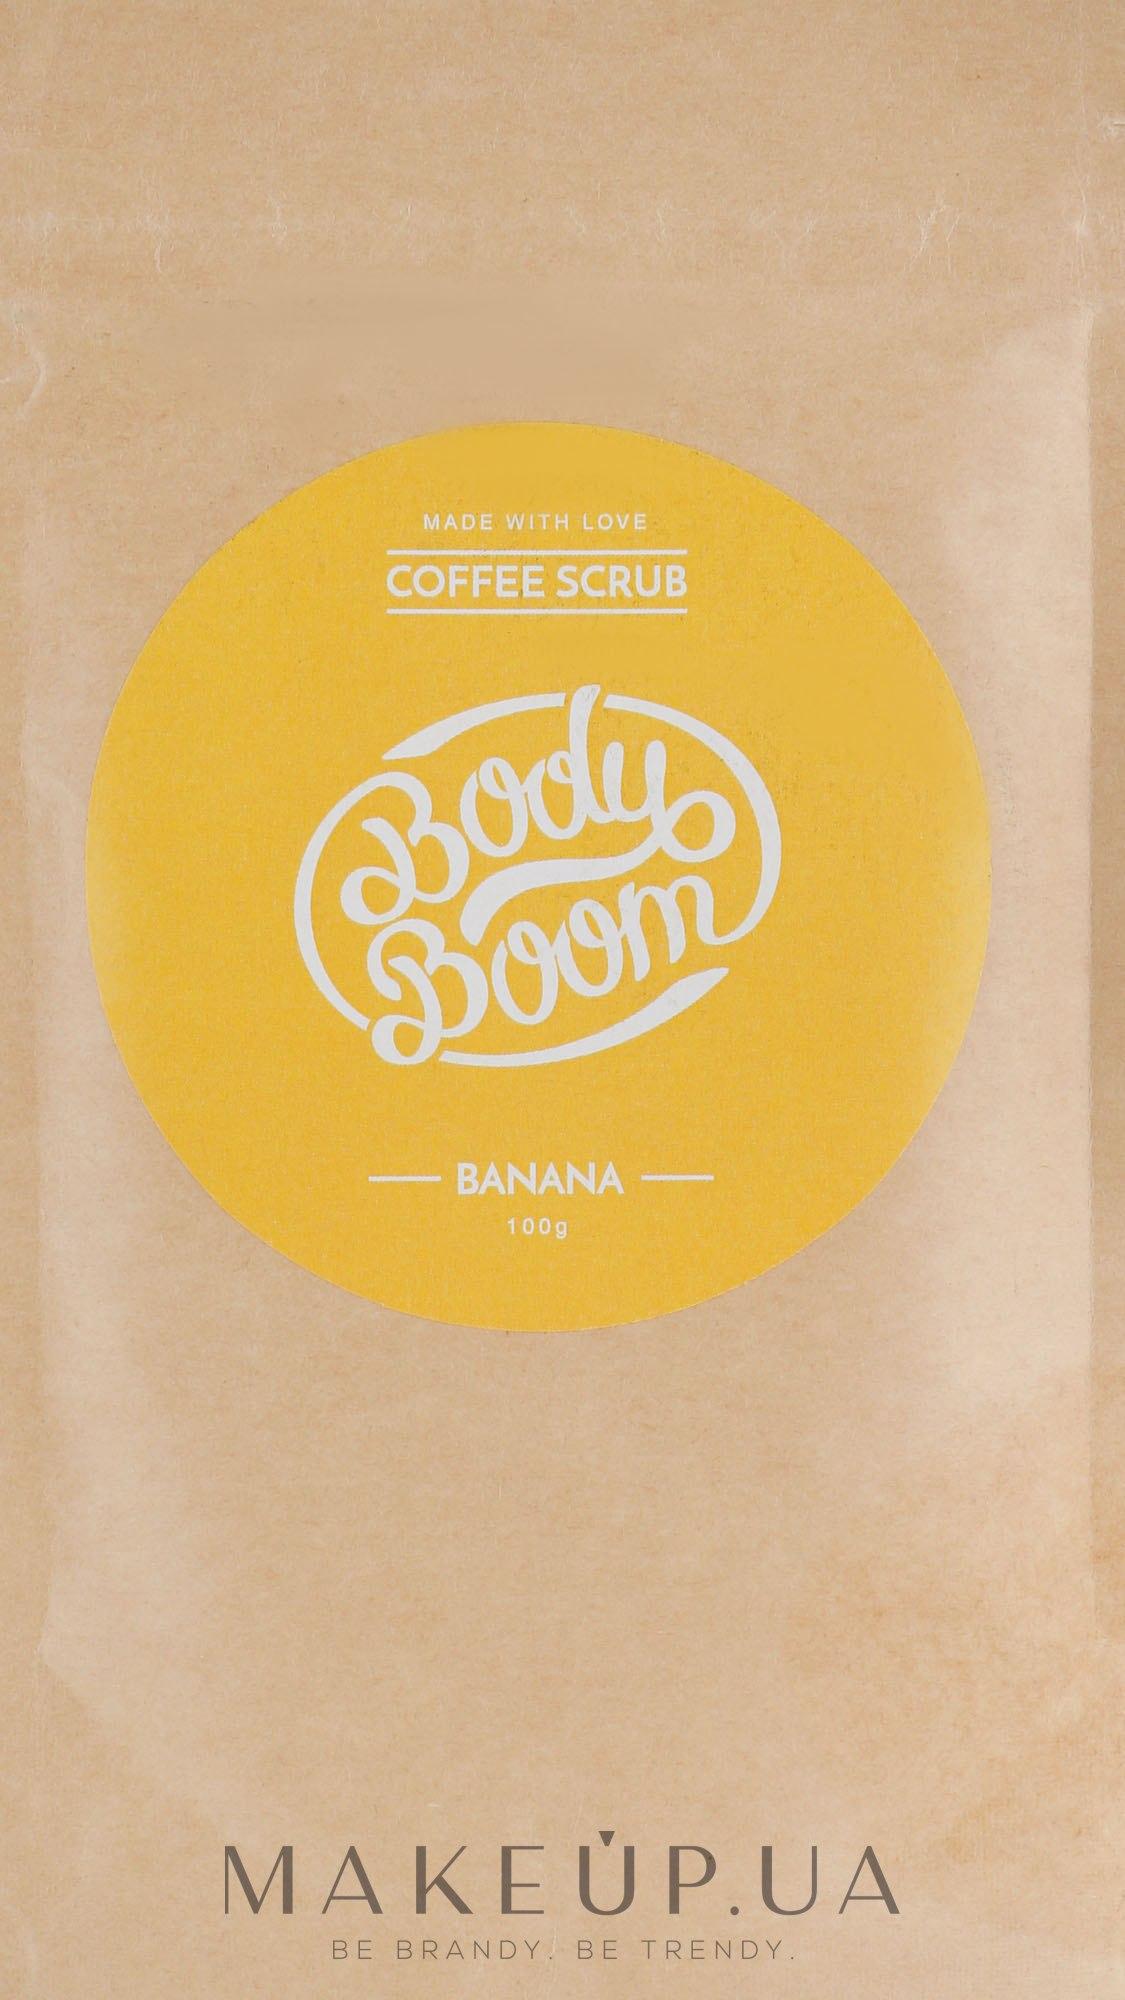 Кофейный скраб, банан - Body Boom Coffee Scrub Banana — фото 100g